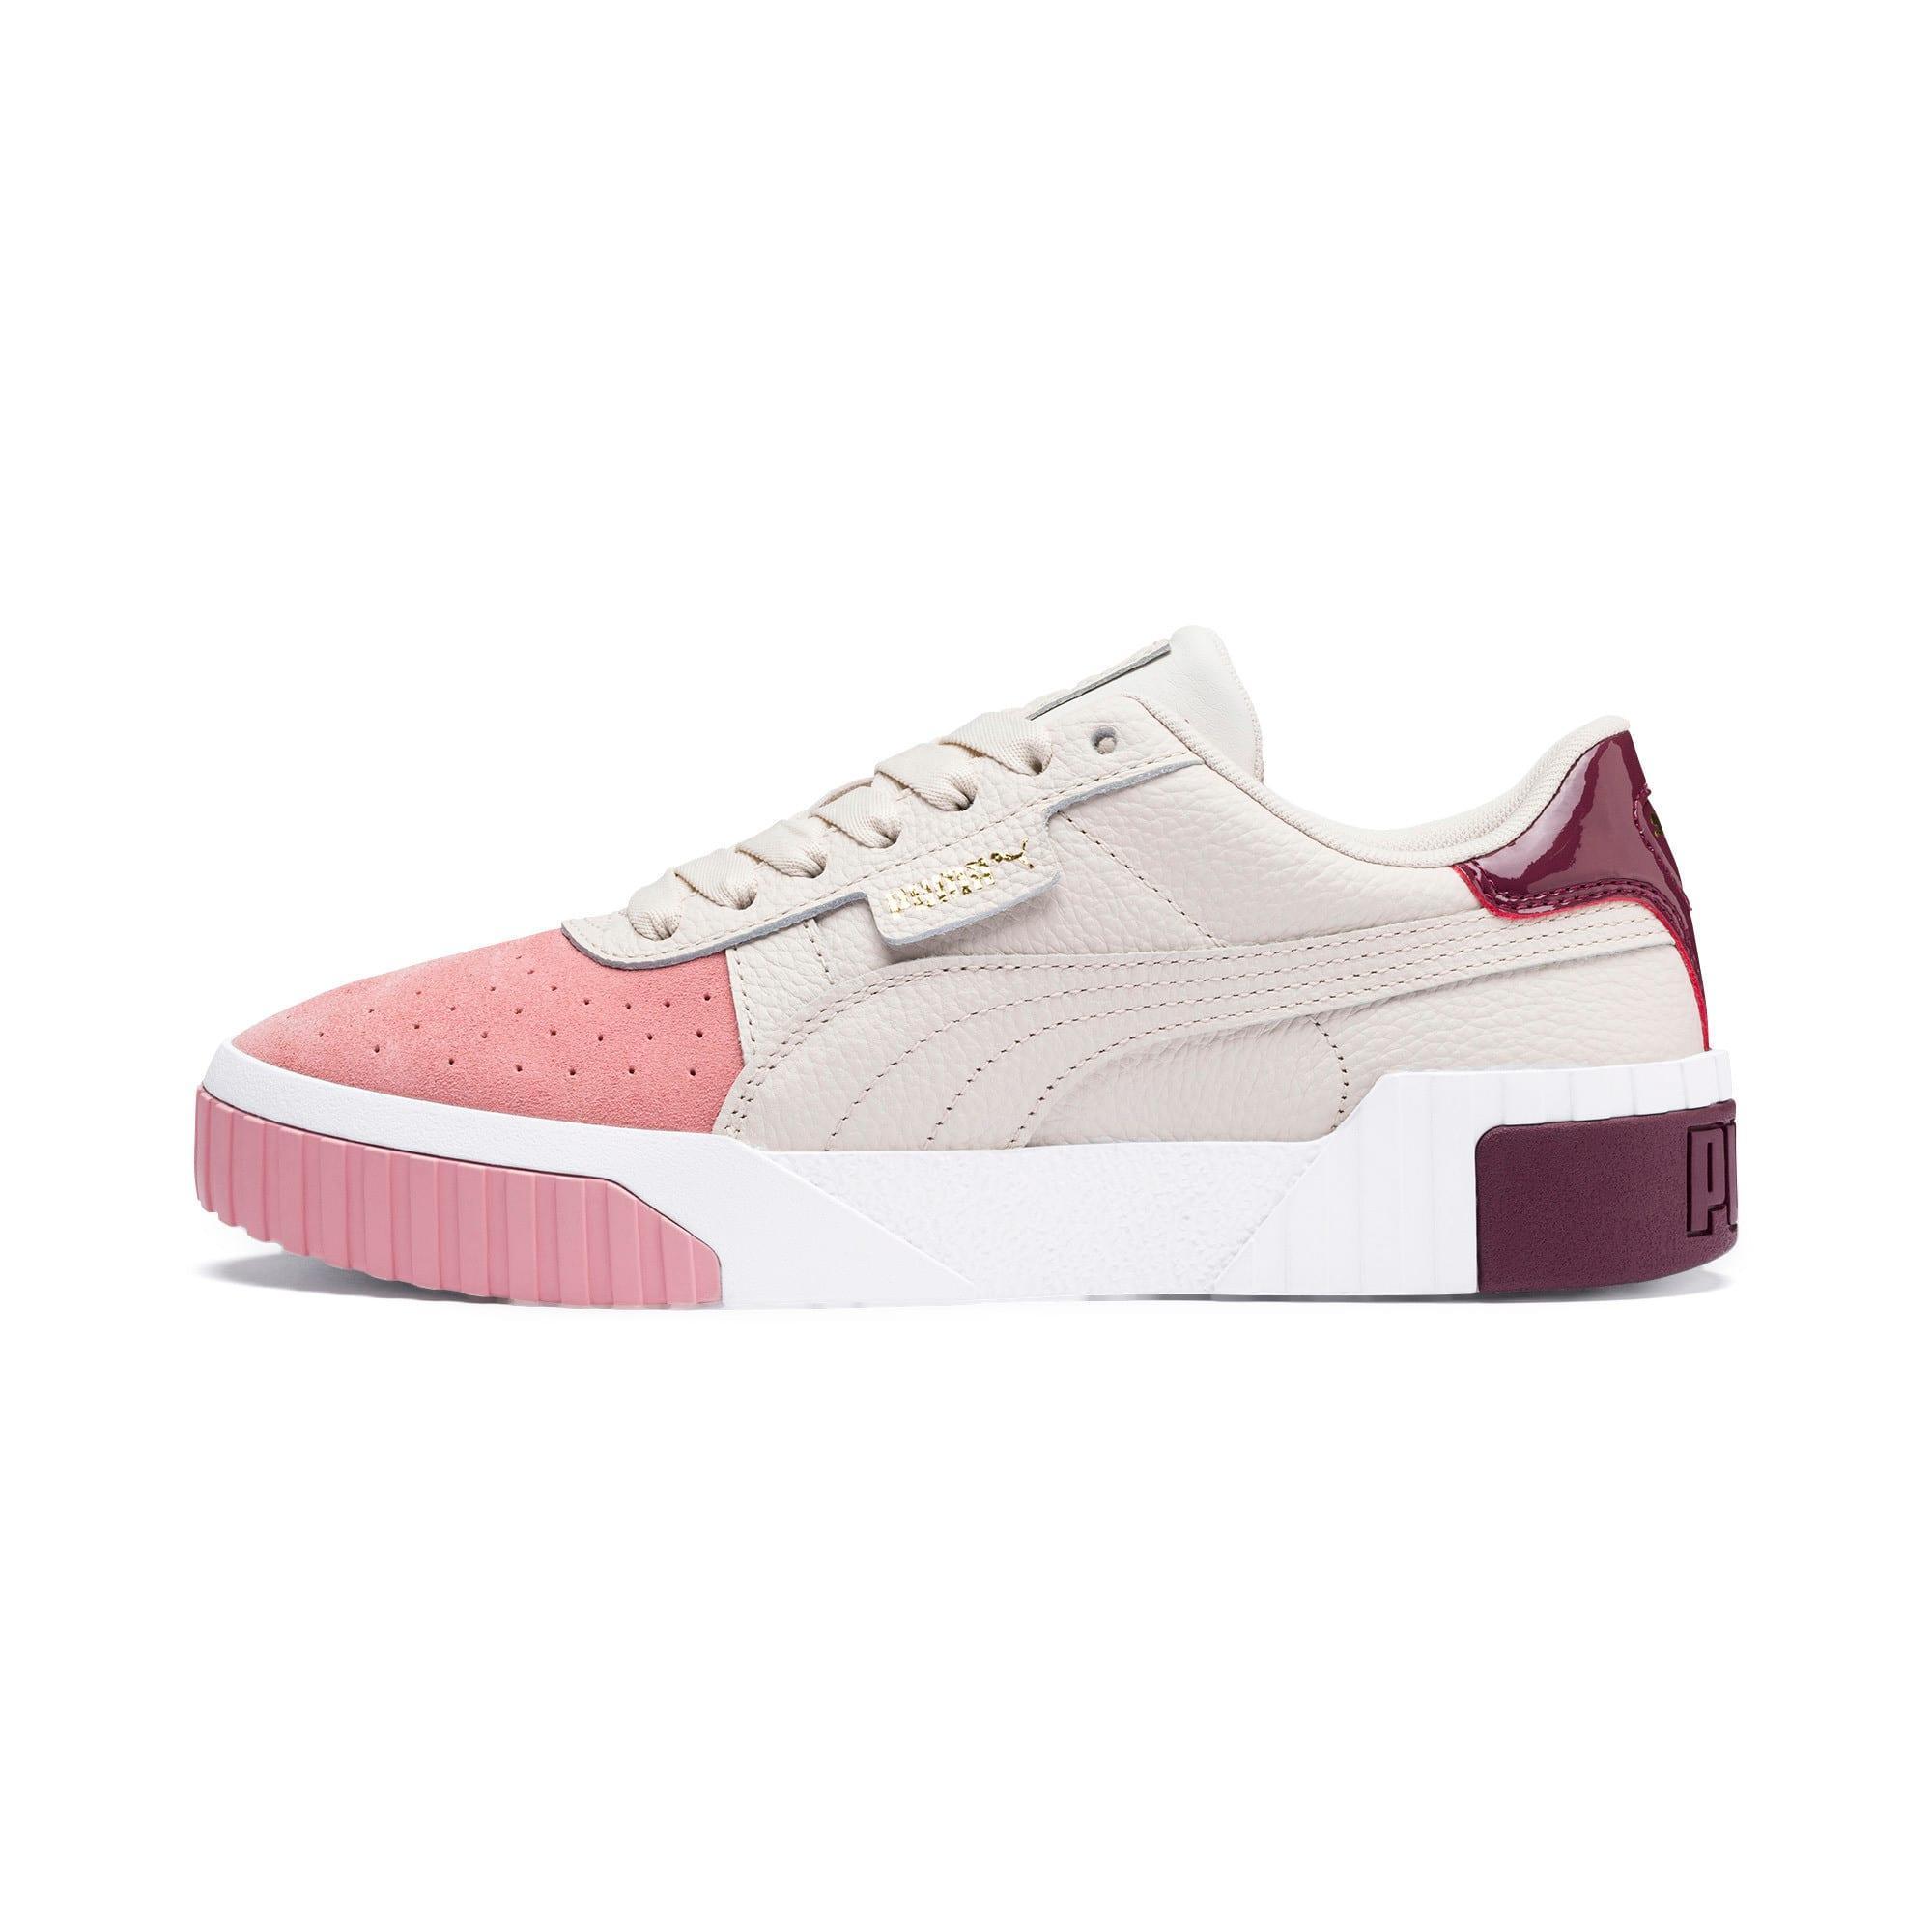 Thumbnail 1 of Cali Remix Women's Sneakers, Pastel Parchment-Bridal Rose, medium